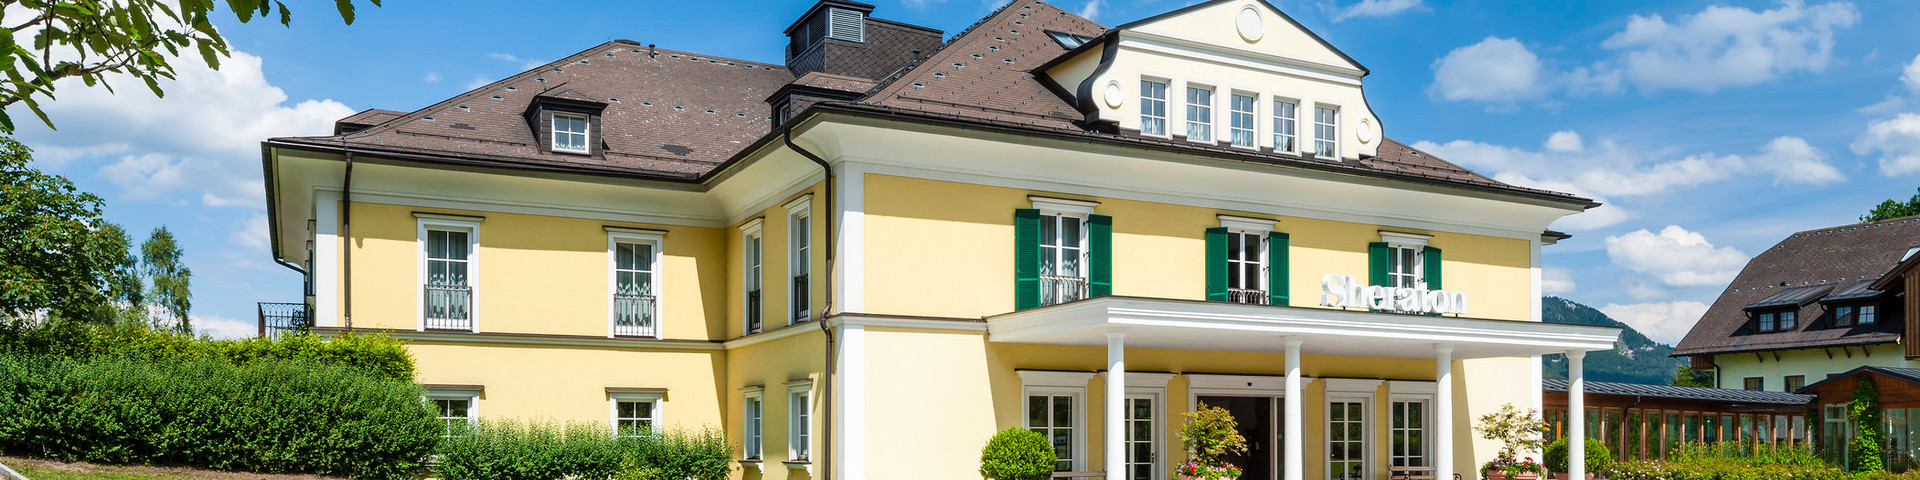 Sheraton Fuschlsee-Salzburg Hotel Jagdhof - Aussenansicht Sommer © Sheraton Fuschlsee-Salzburg Hotel Jagdhof